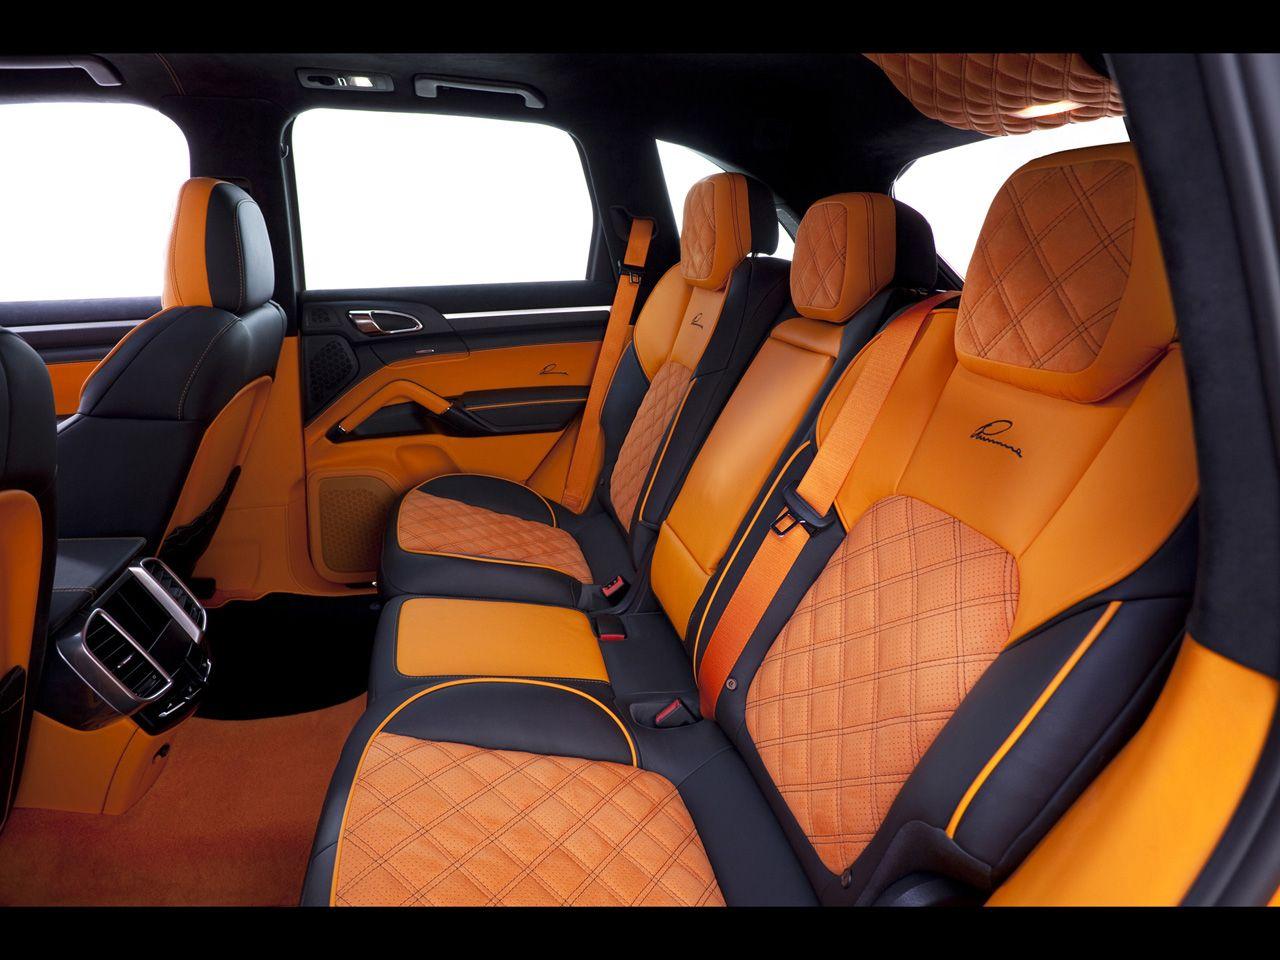 2012 Lumma Design Porsche Cayenne Custom Car Interior Car Interior Upholstery Porsche Cayenne